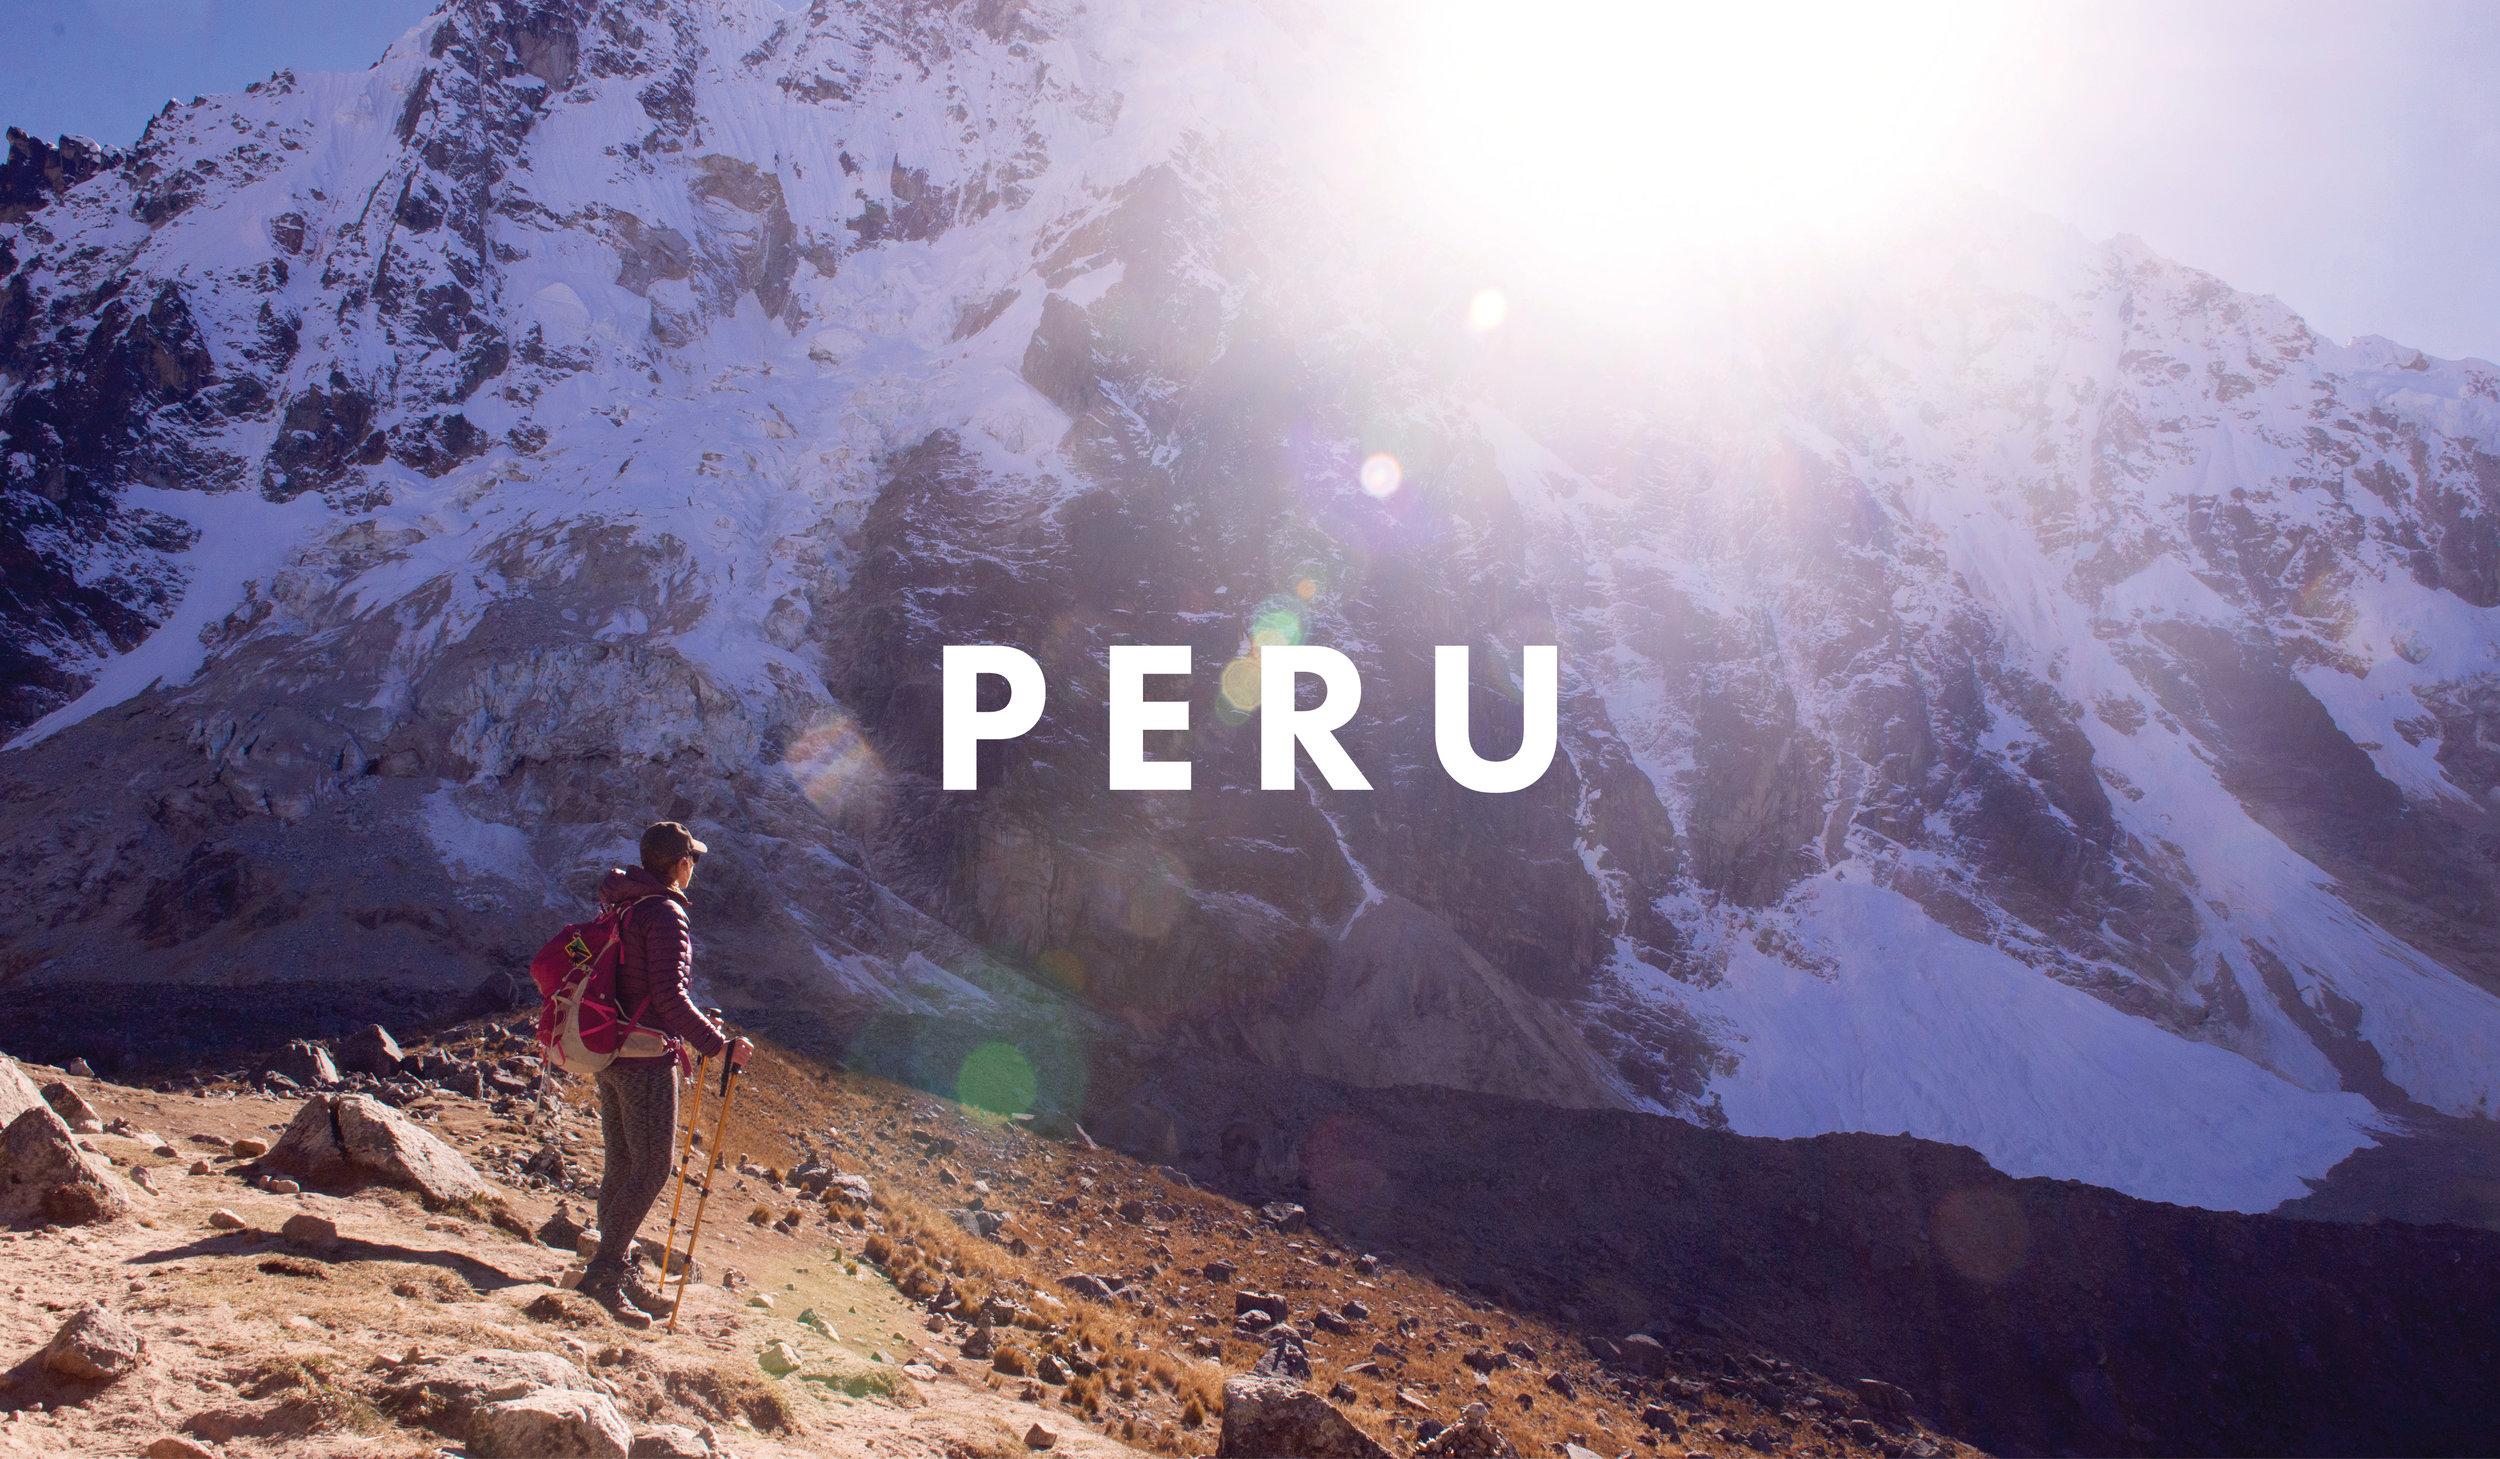 PERU with WHOA3.jpg